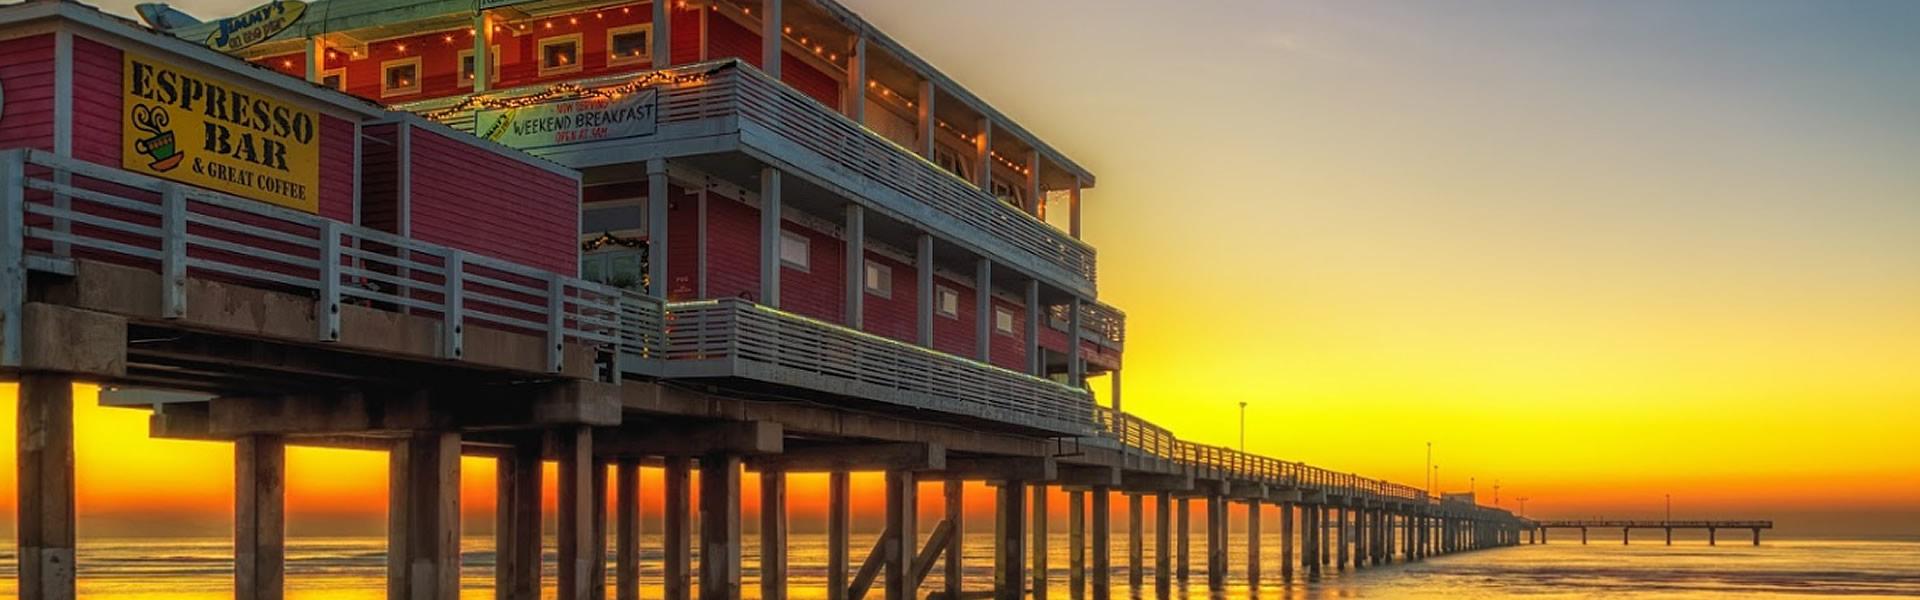 Galveston Fishing Pier, Galveston TX